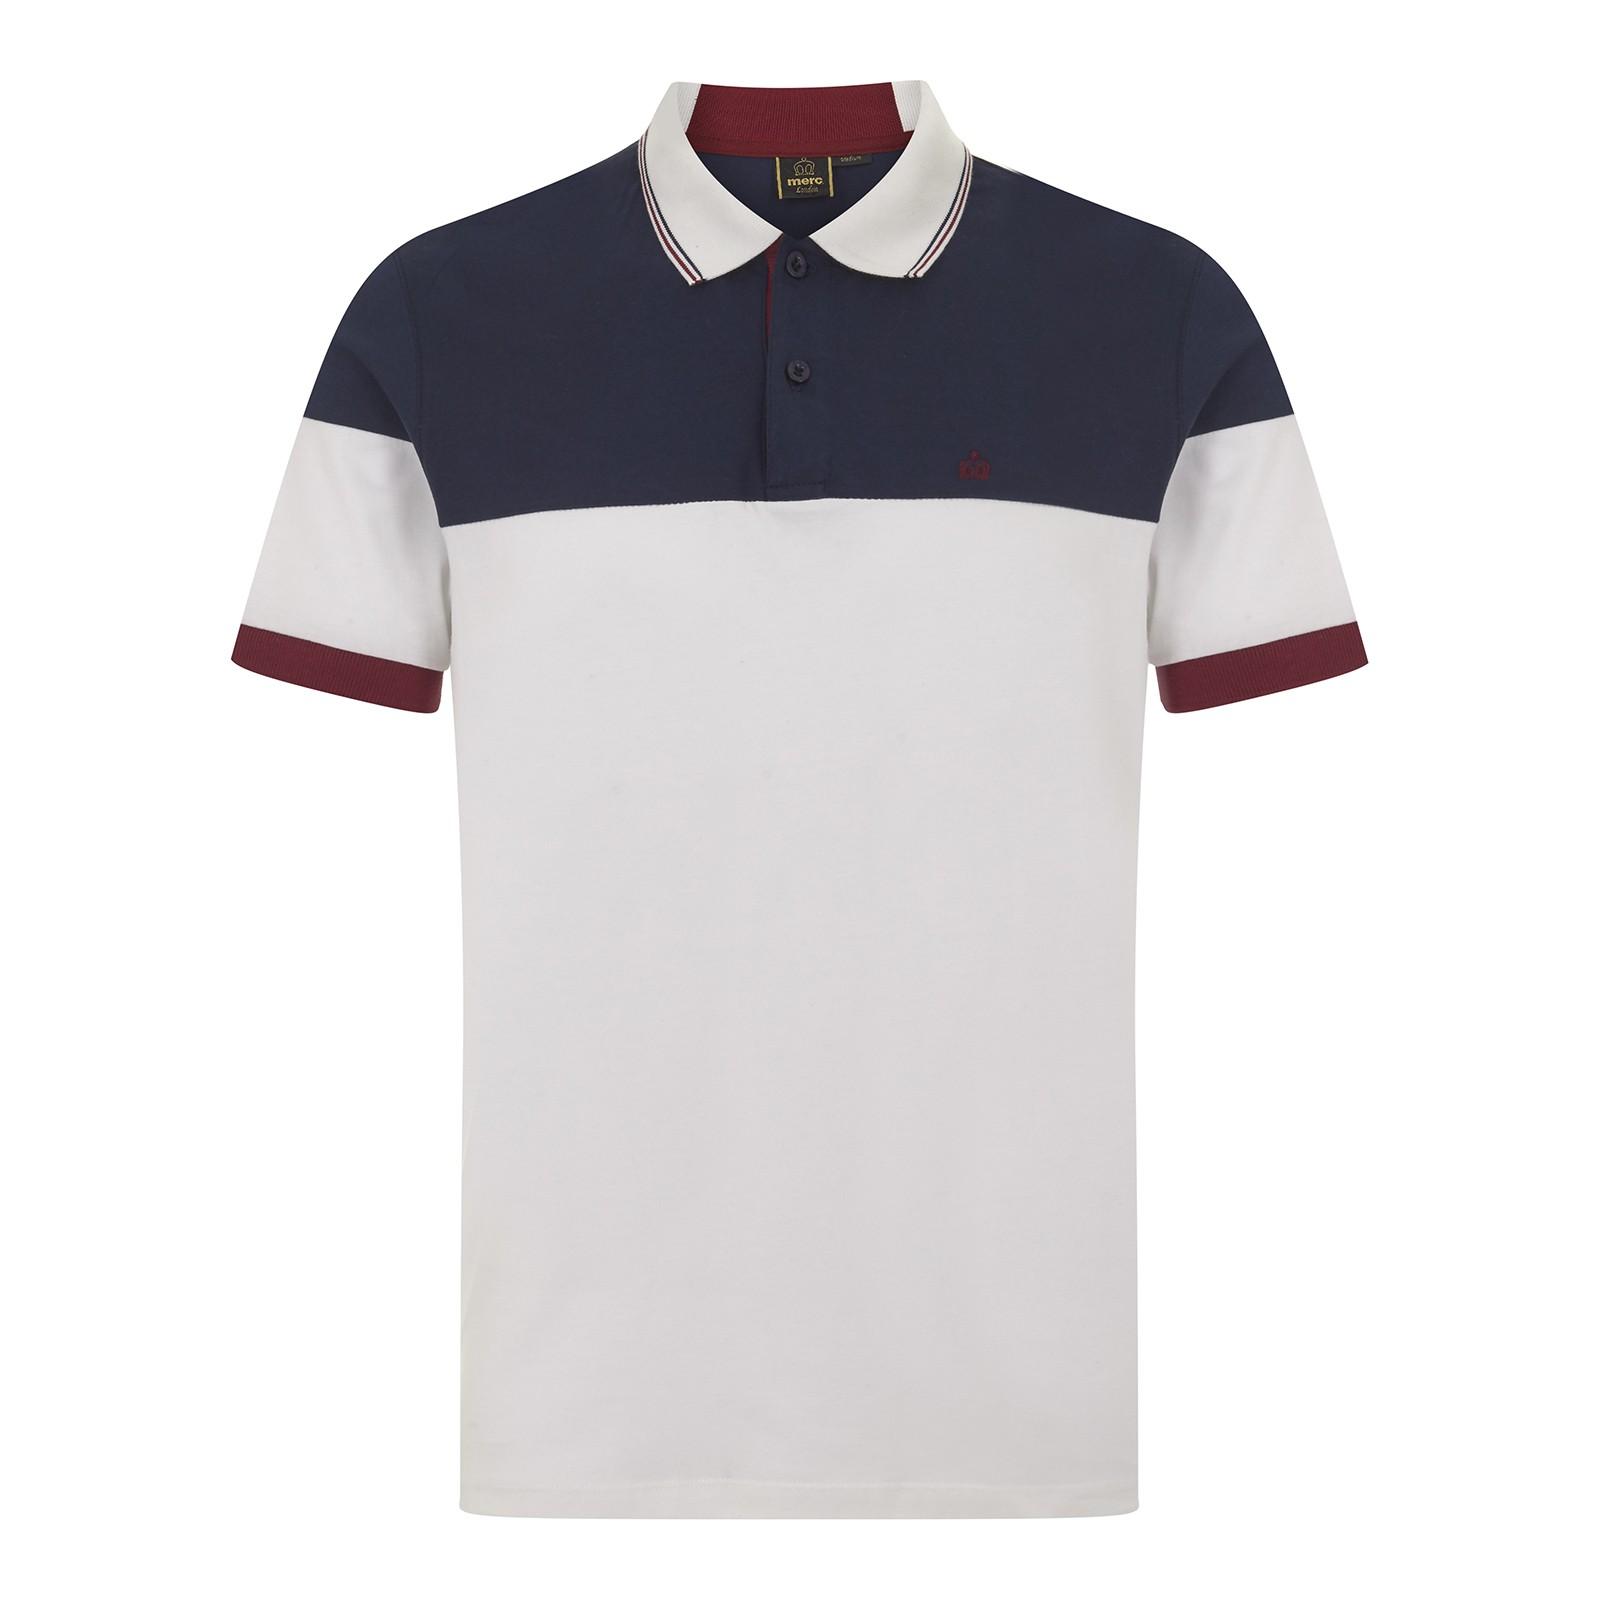 Koszulka polo MERC LONDON KRUGER KNITTED POLO, biała